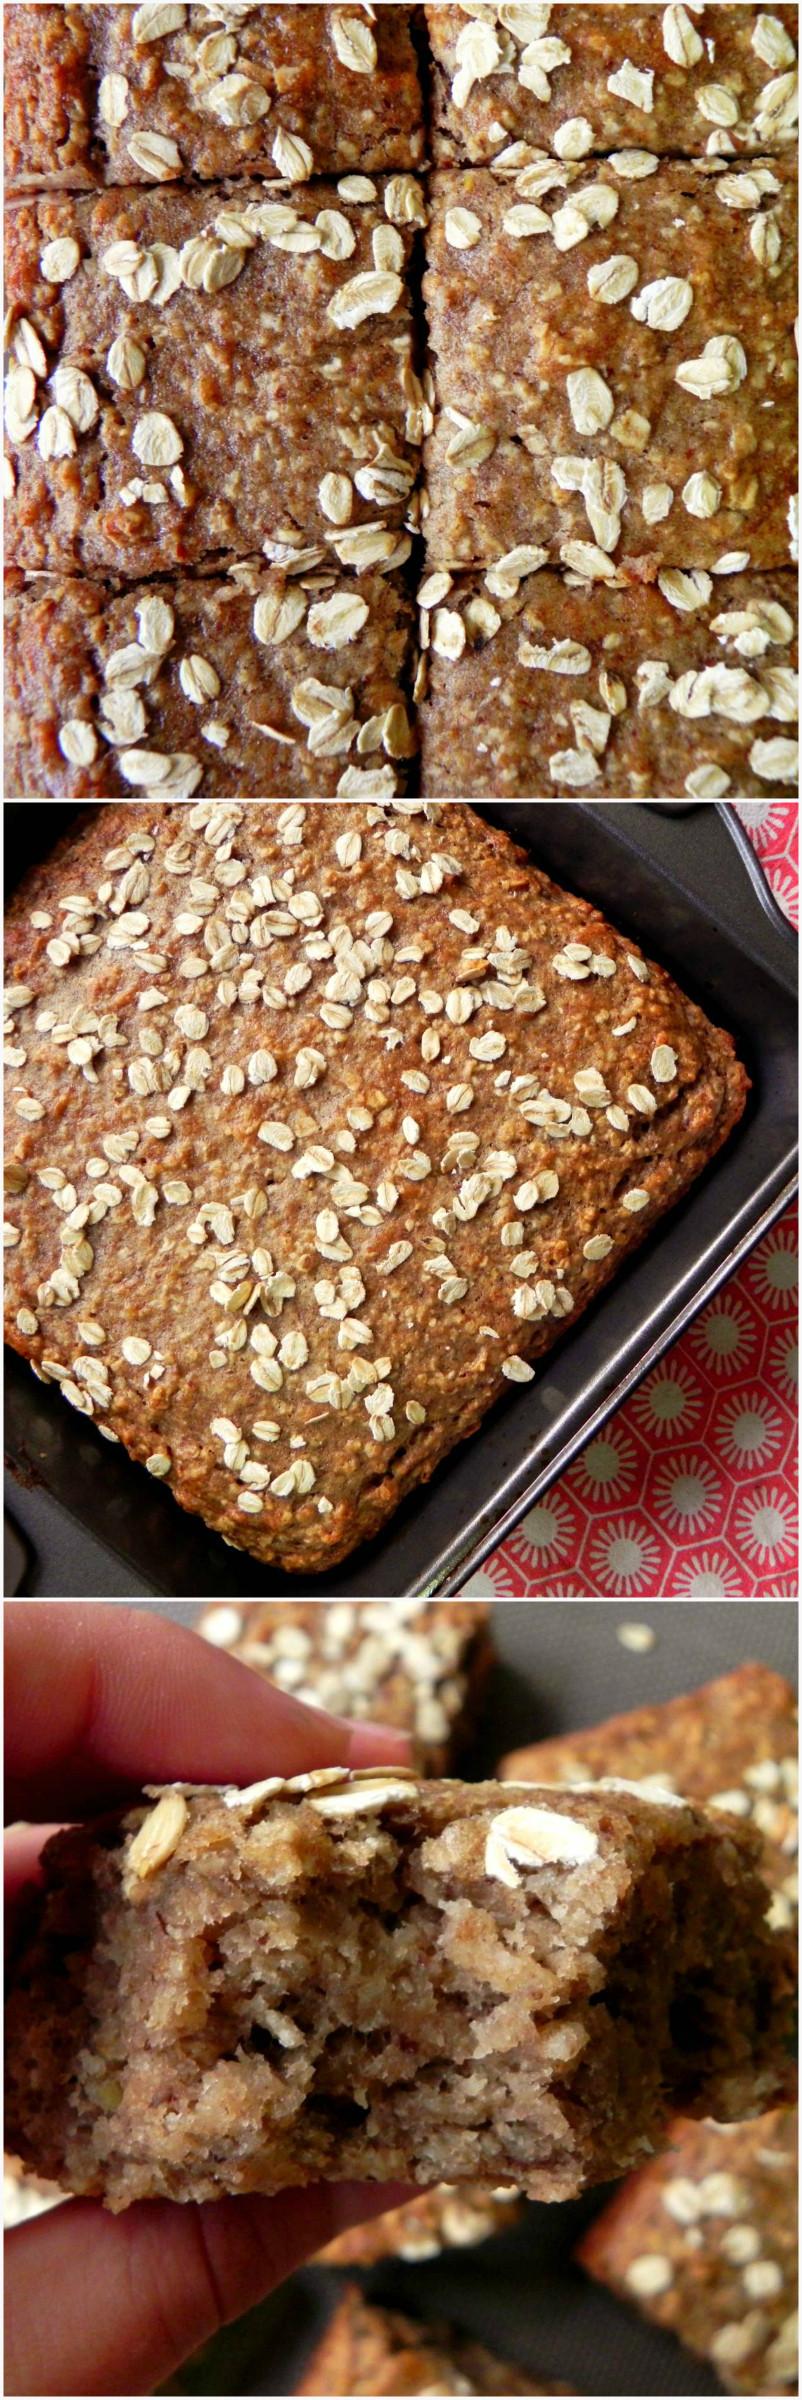 Healthy Vegan Bread  Vegan Banana Oat Bread